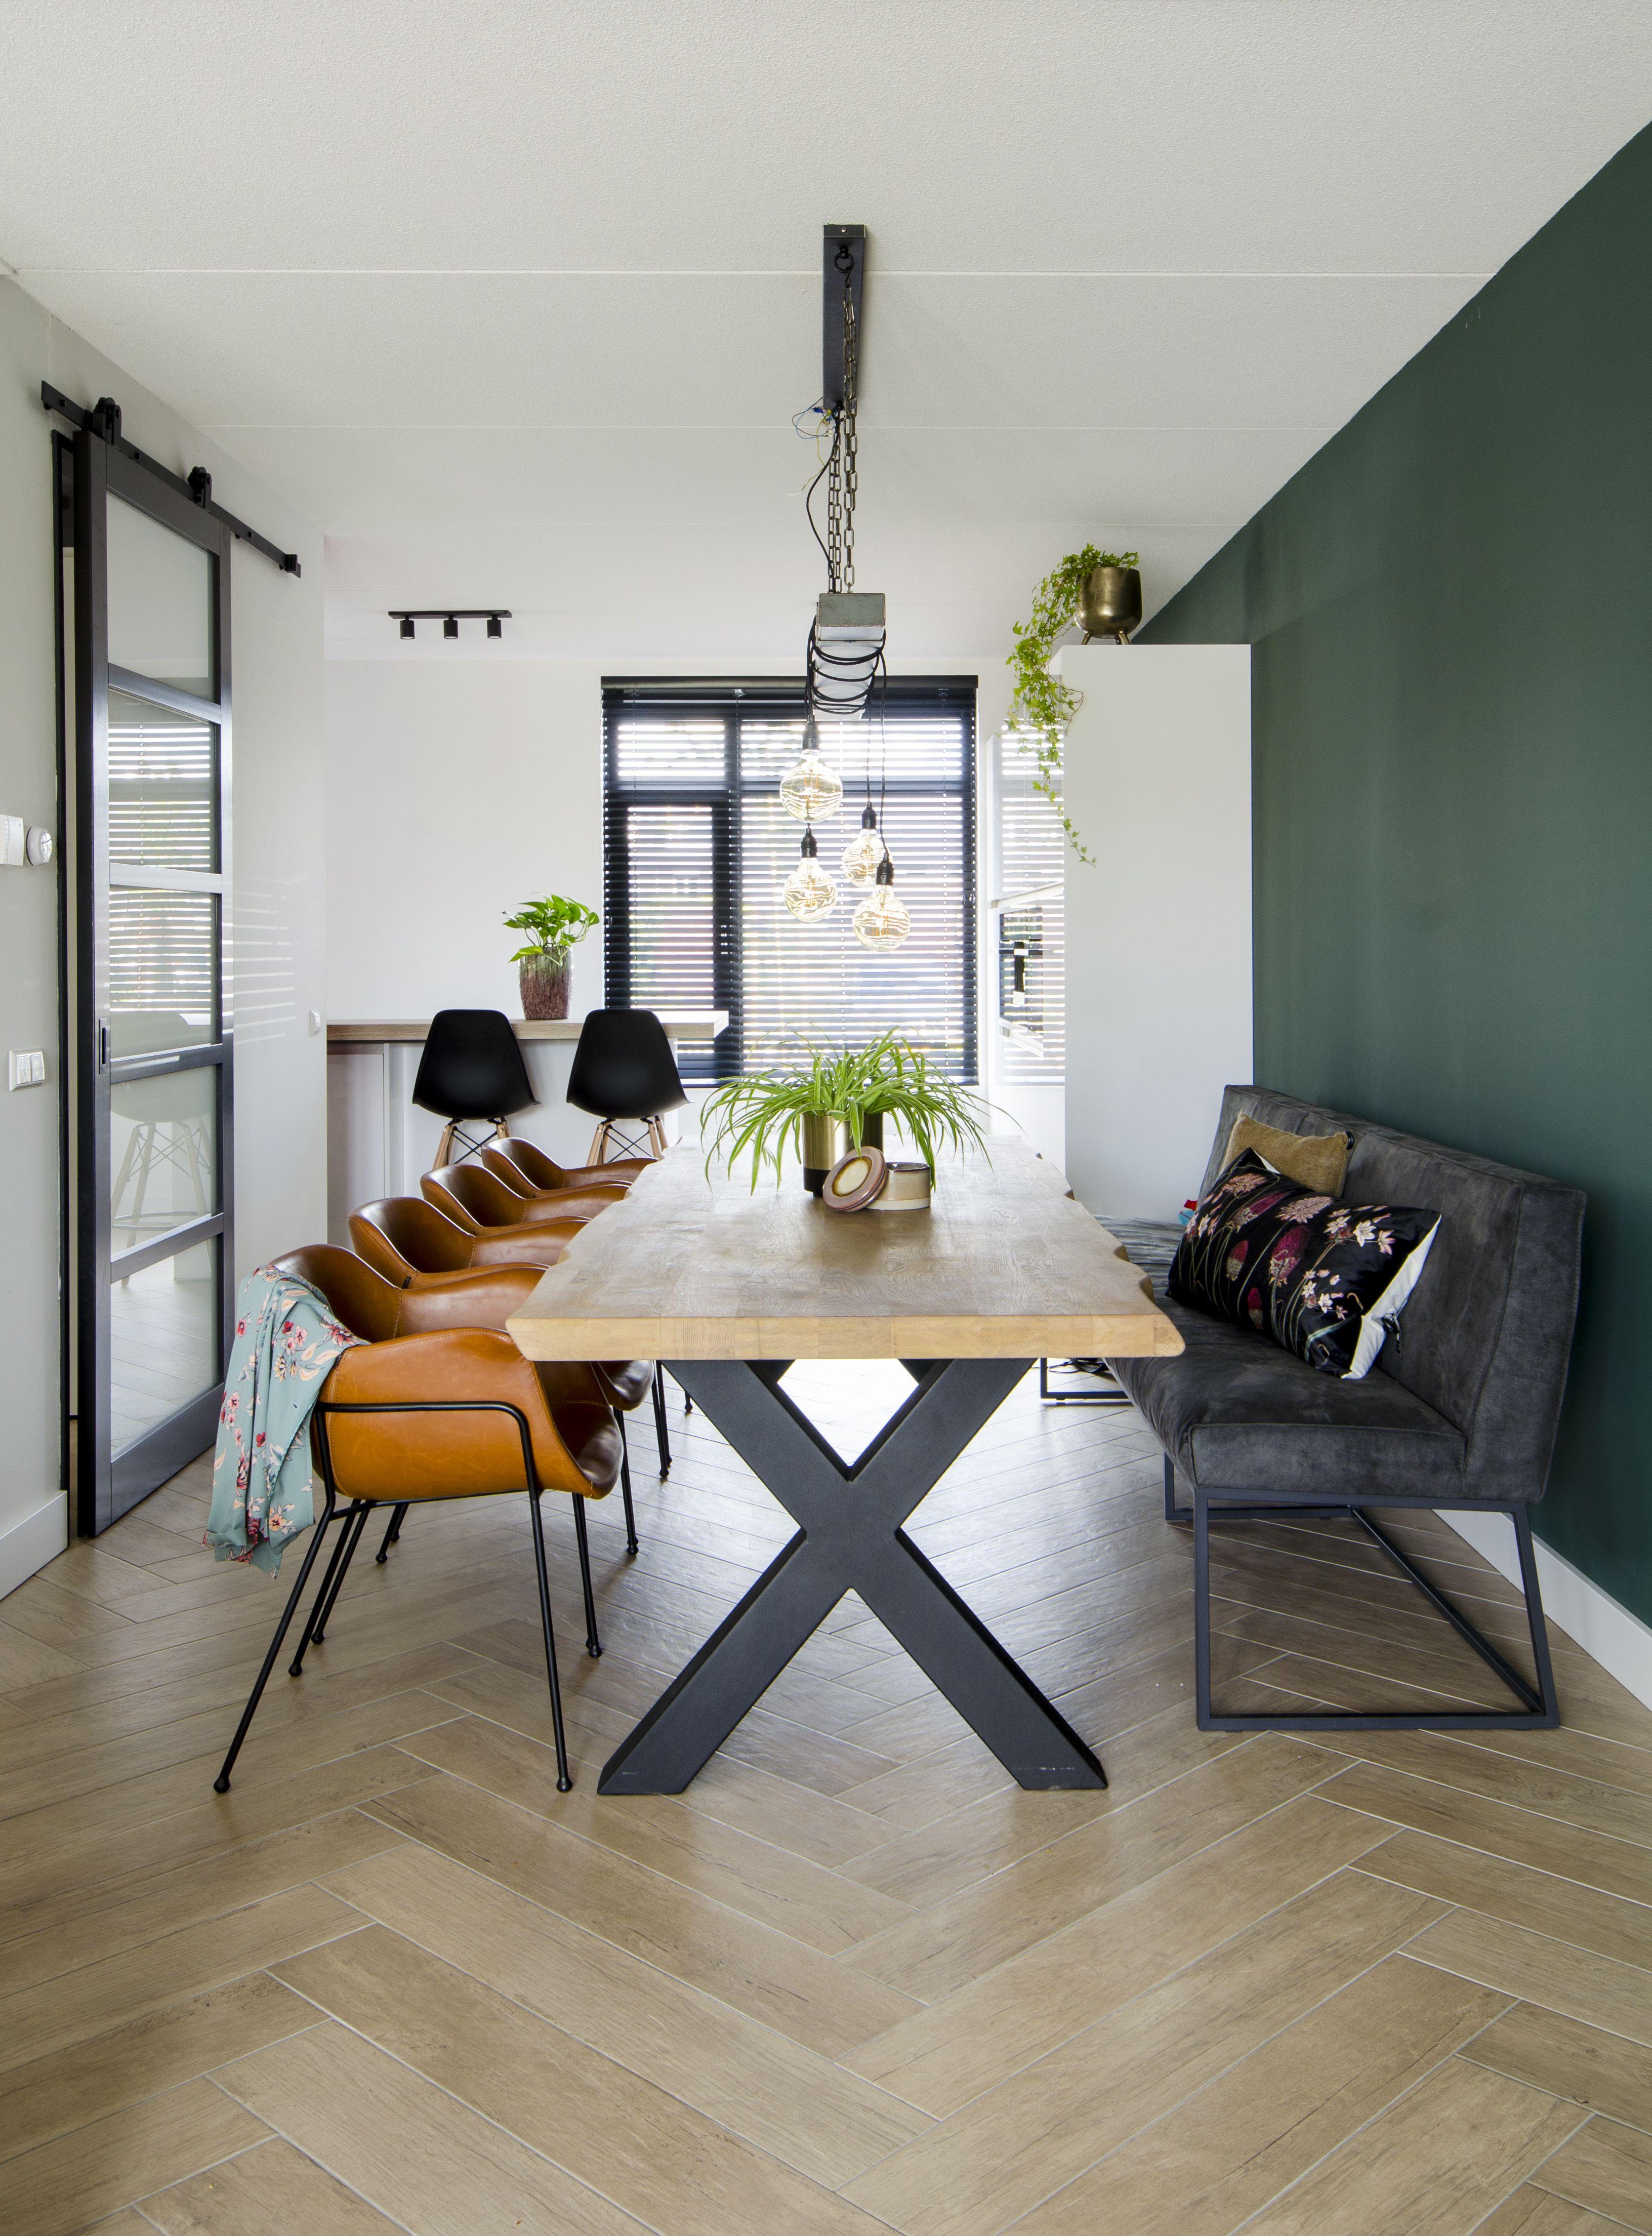 Betere woonkamer #binnenkijker #interieur #inspiratie #eetkamer HOME MADE XN-68